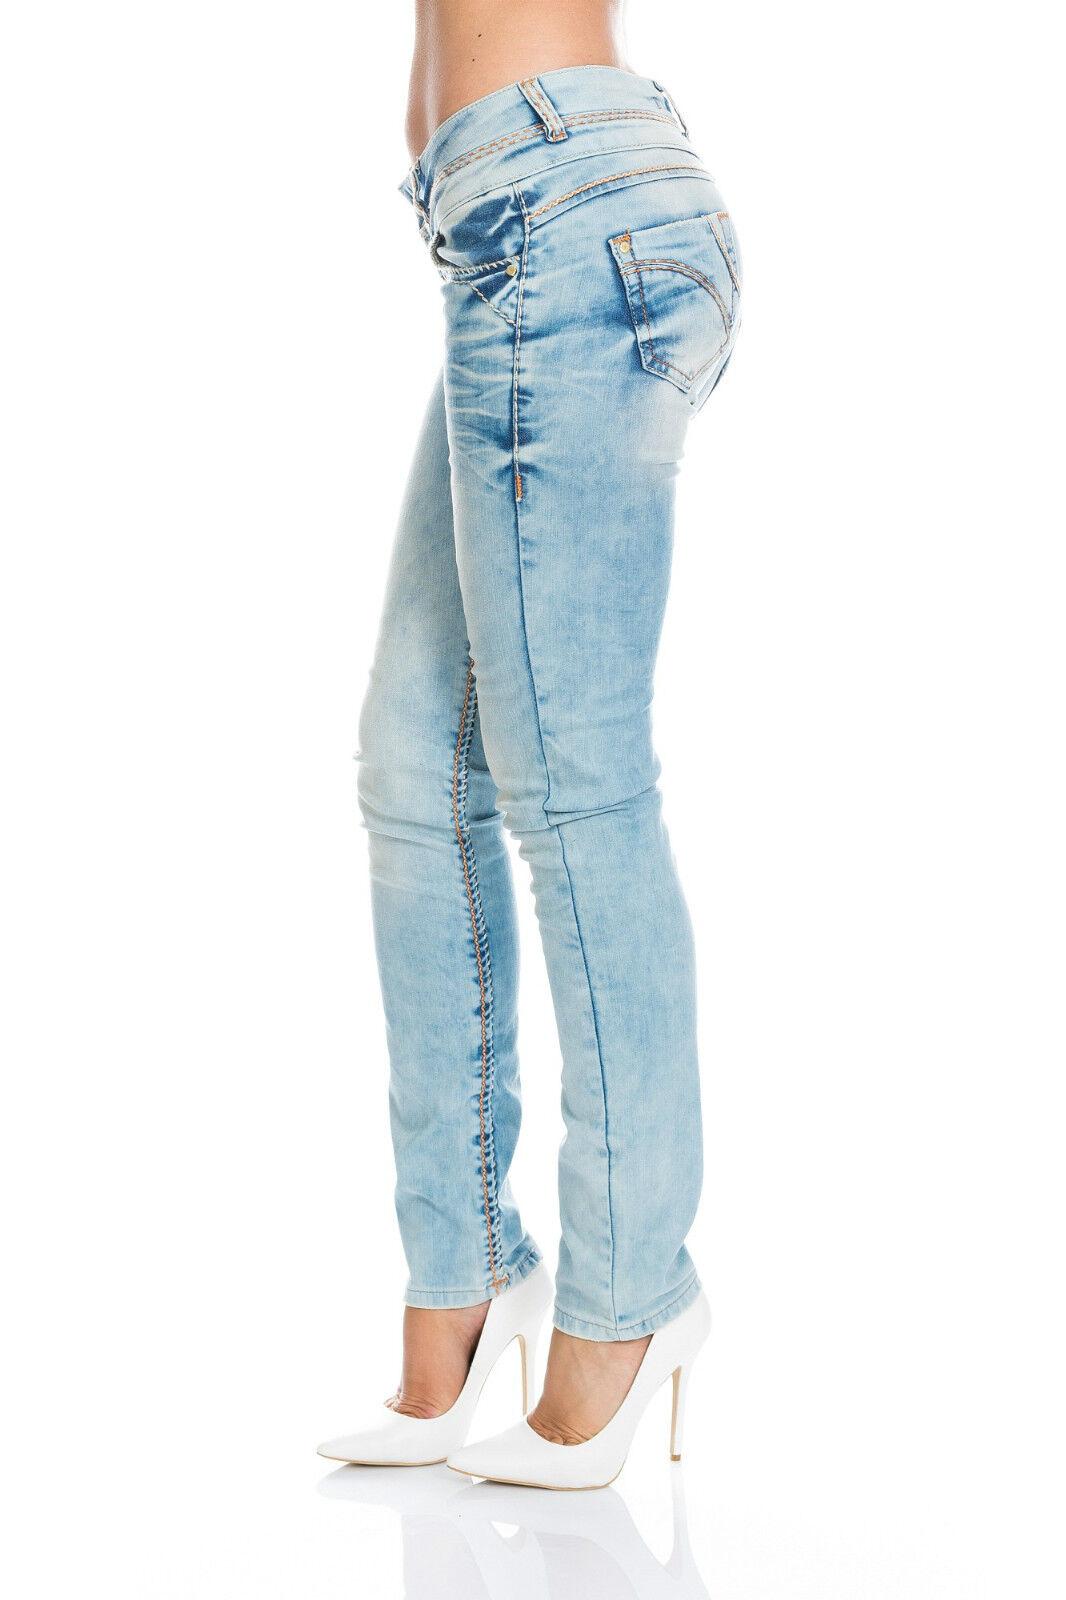 Sexy ♥ Cipo & Baxx ♥ Donna Jeans Designer Blu Blu Blu 347a w25 26 27 28 29 30 31 32 2f4db2